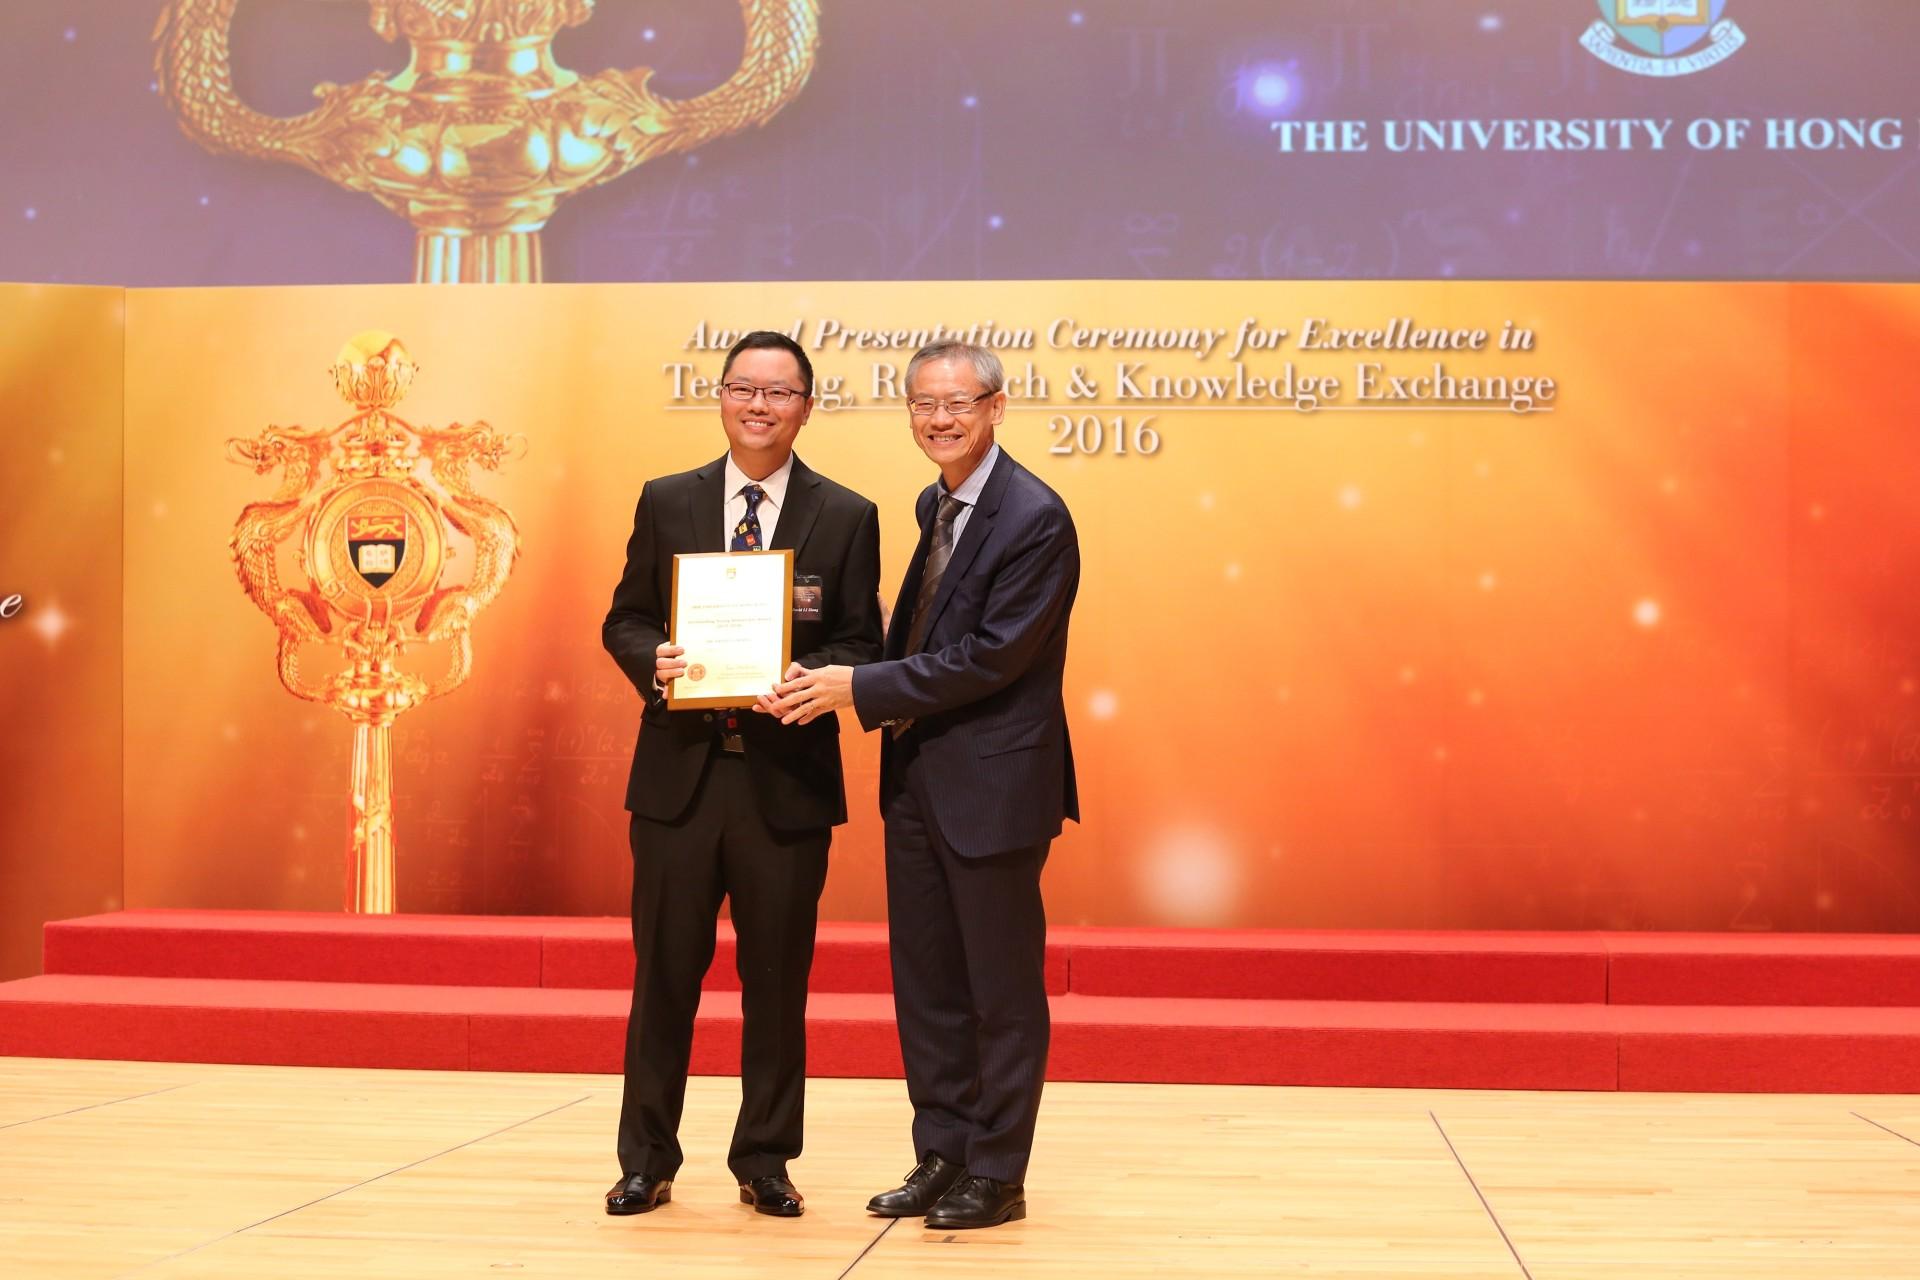 2016 Award Presentation Ceremony